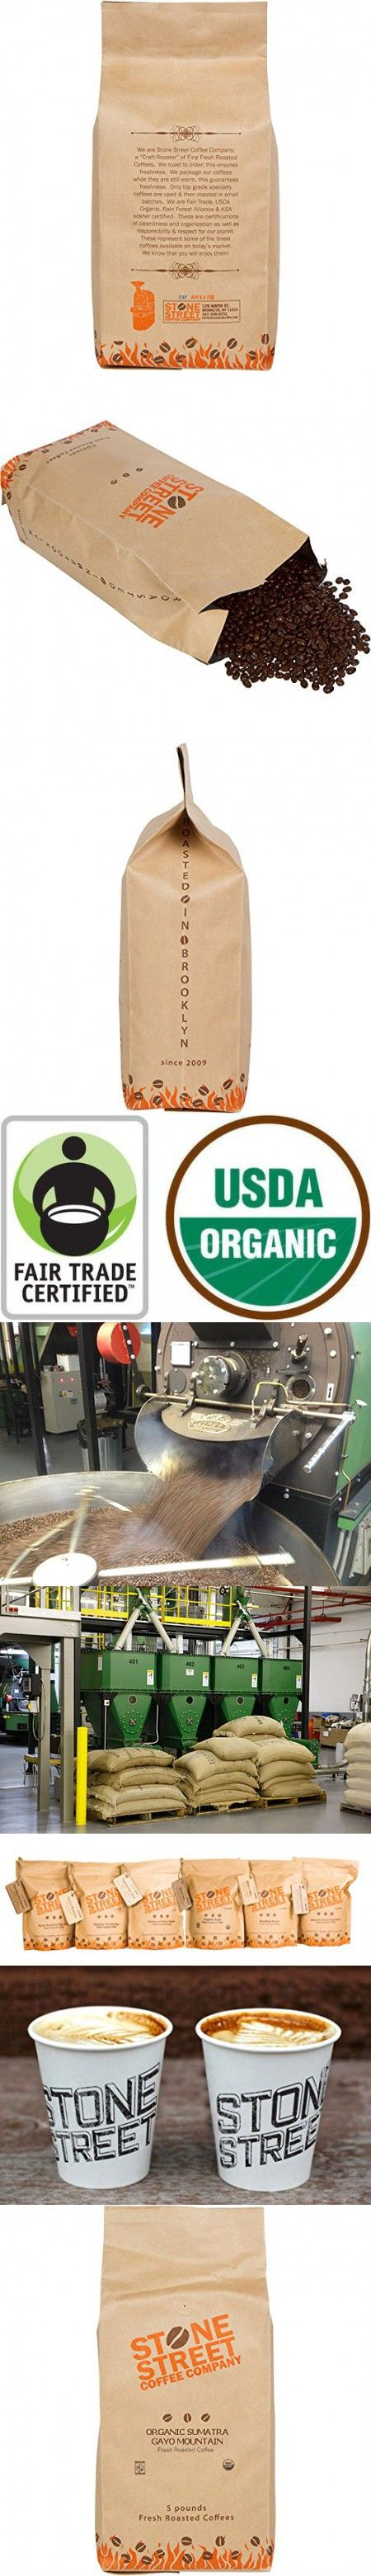 DARK SUMATRA ORGANIC Fair Trade Coffee   Whole Beans   5 Lb Bulk Large Bag   Premium Select Indonesian Coffee Origin